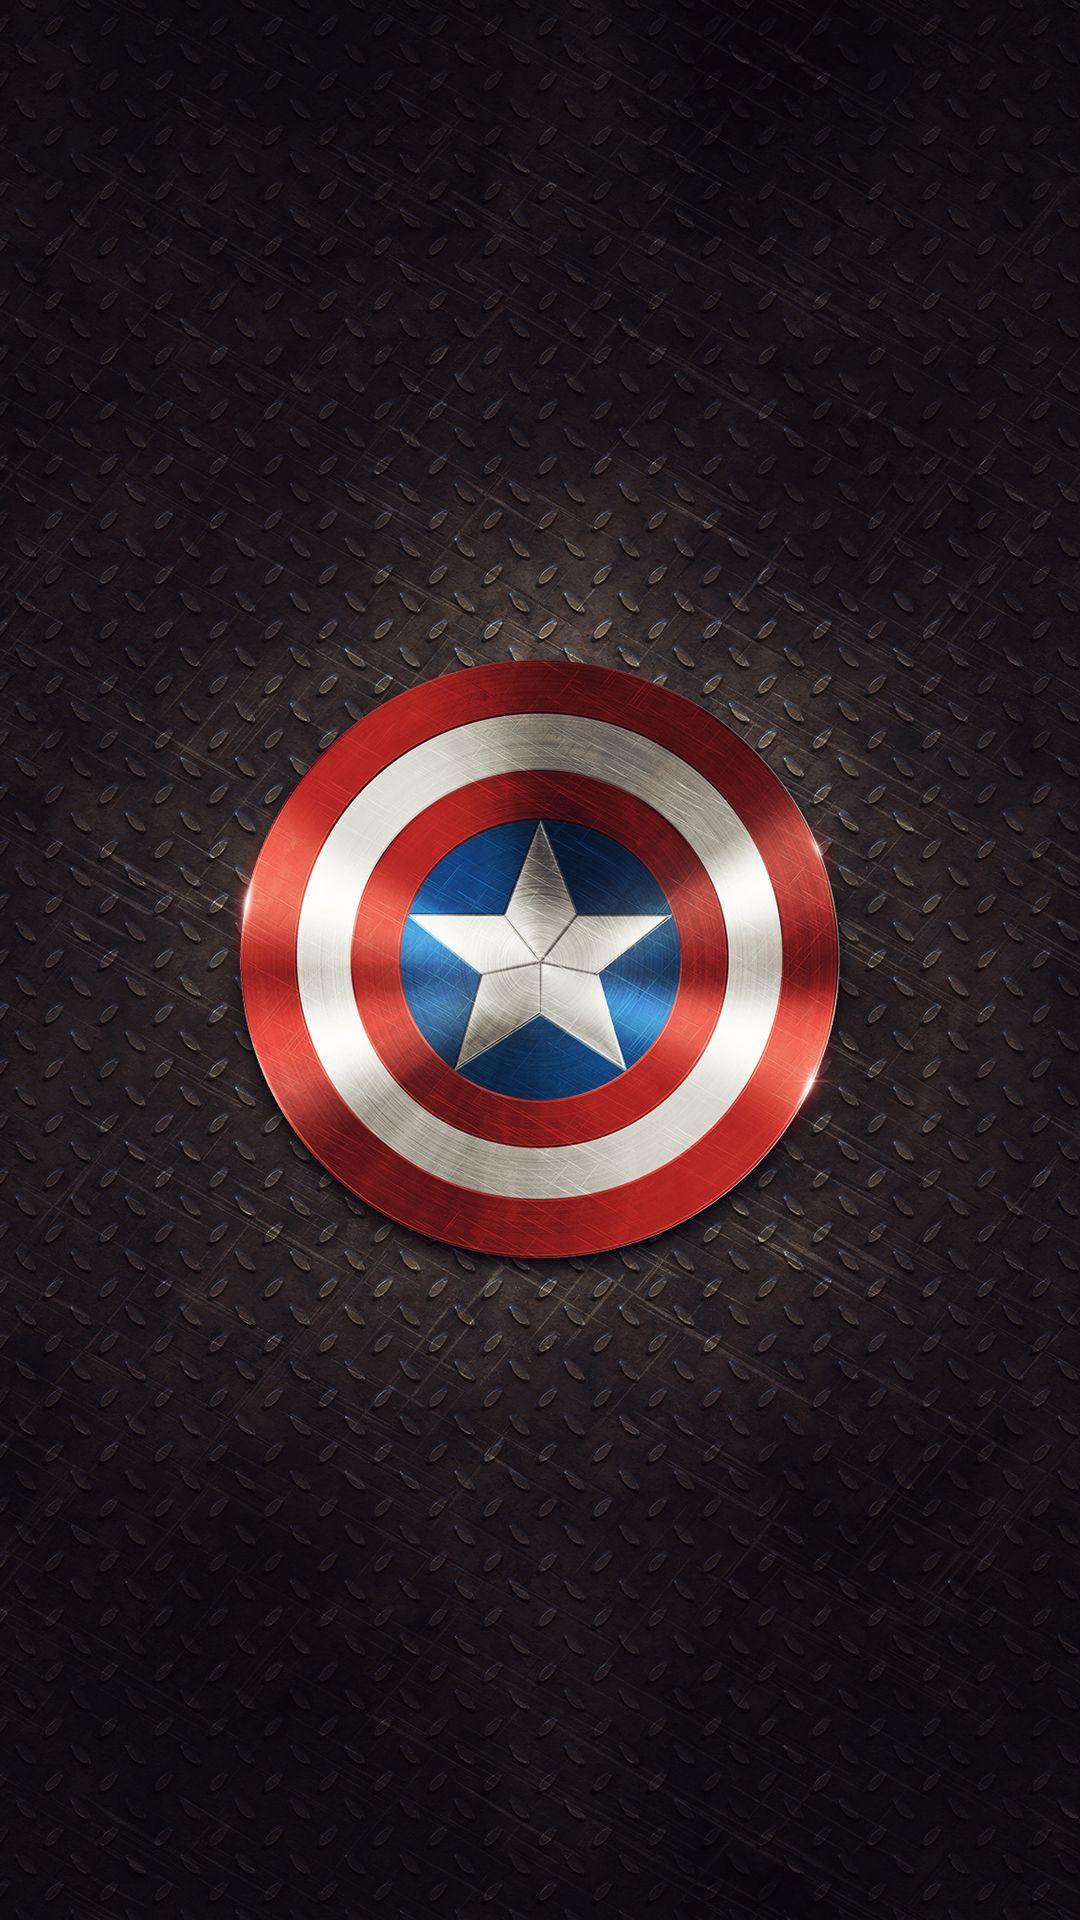 Captain America Shield Captain america wallpaper Captain 1080x1920